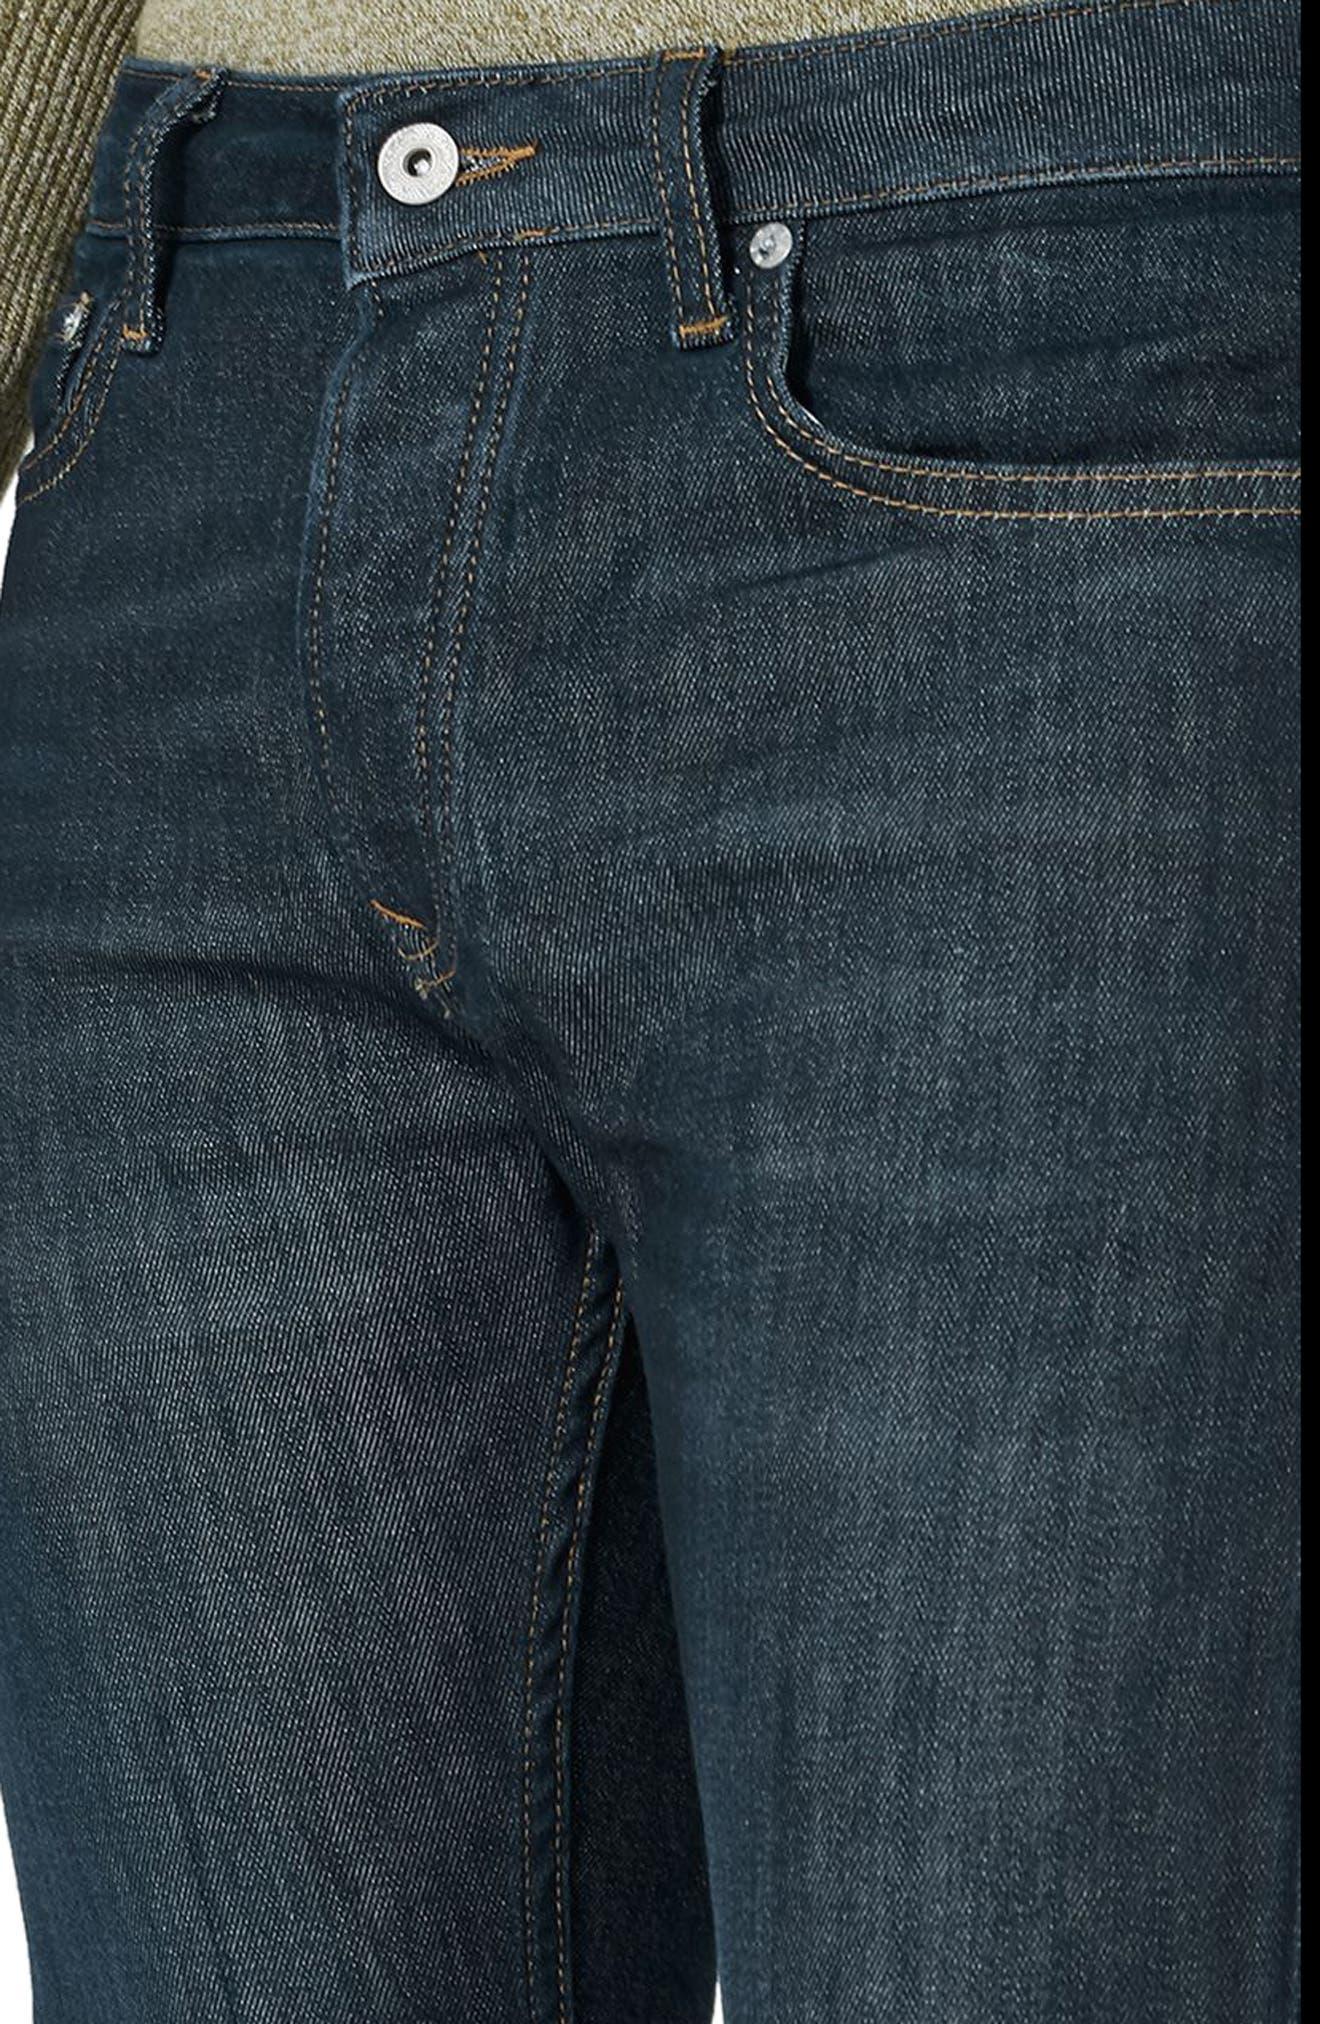 Coated Denim Skinny Jeans,                             Alternate thumbnail 3, color,                             Blue